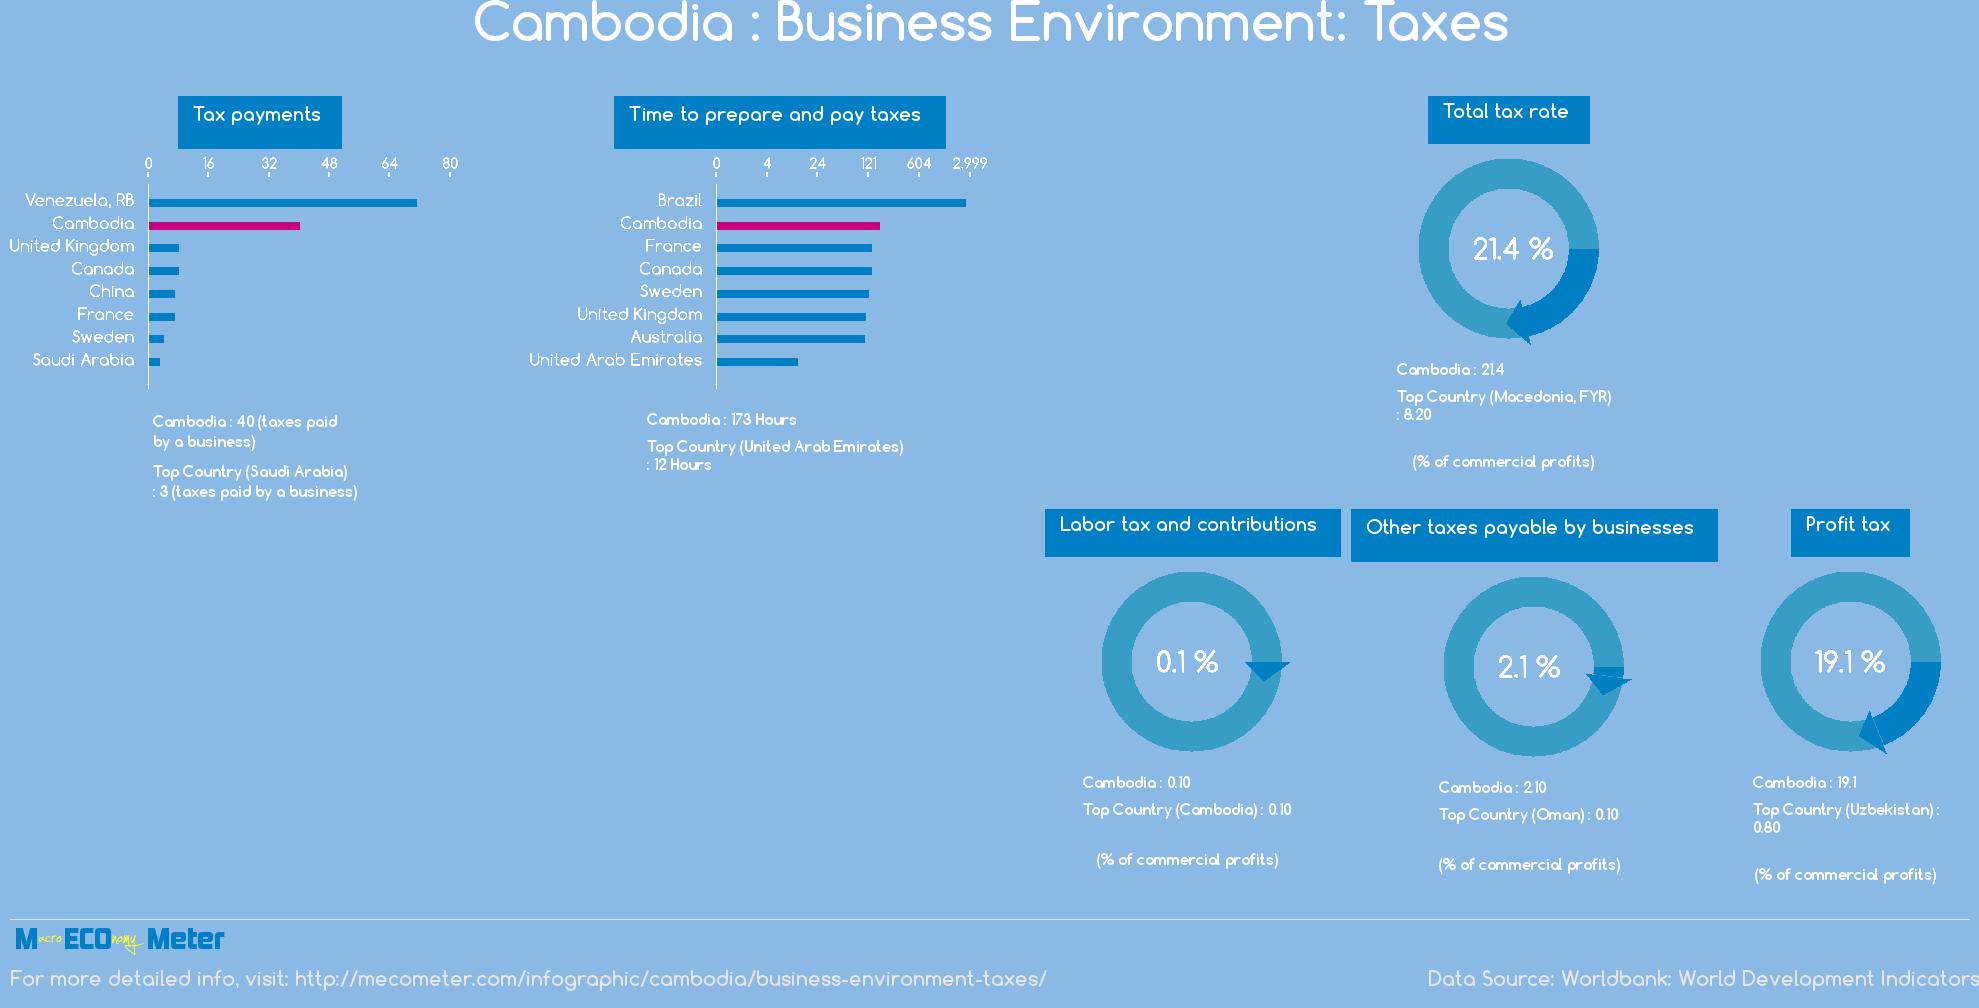 Cambodia : Business Environment: Taxes